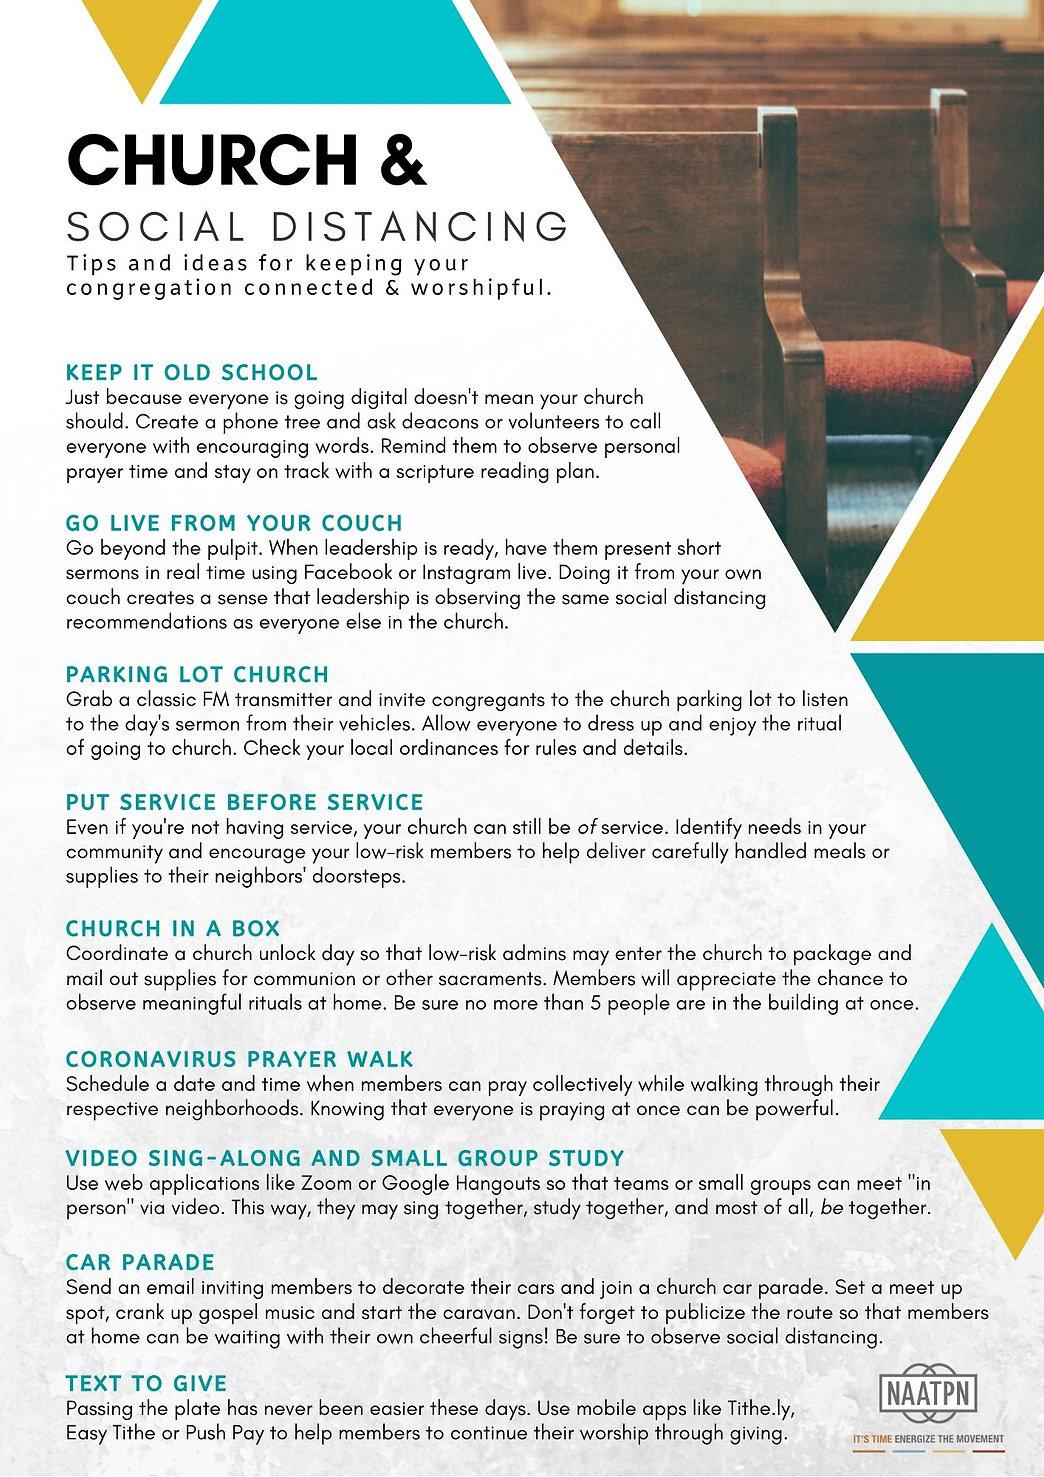 church and social distancing.jpg